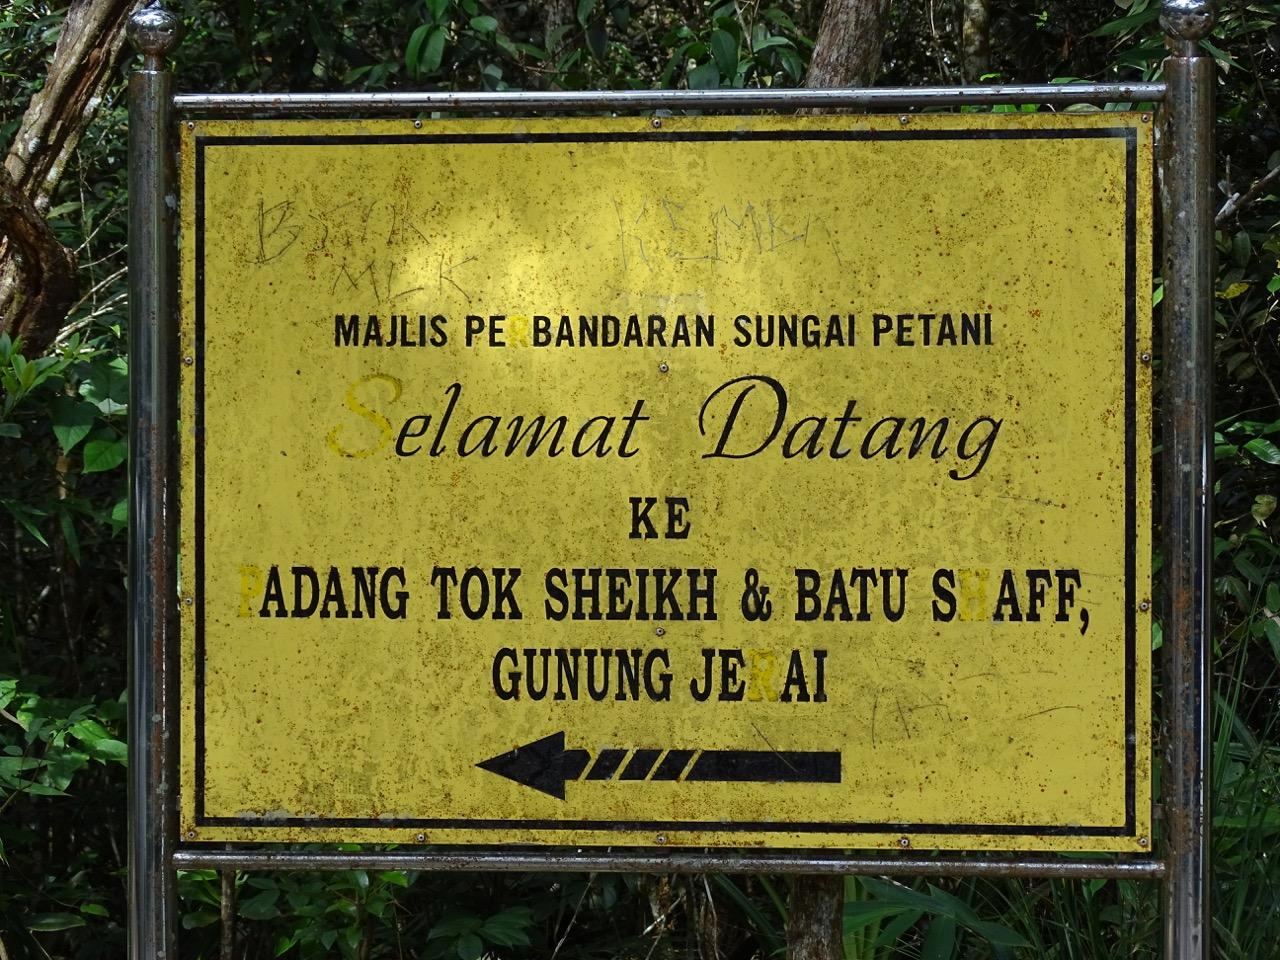 Padang Tok Sheikh